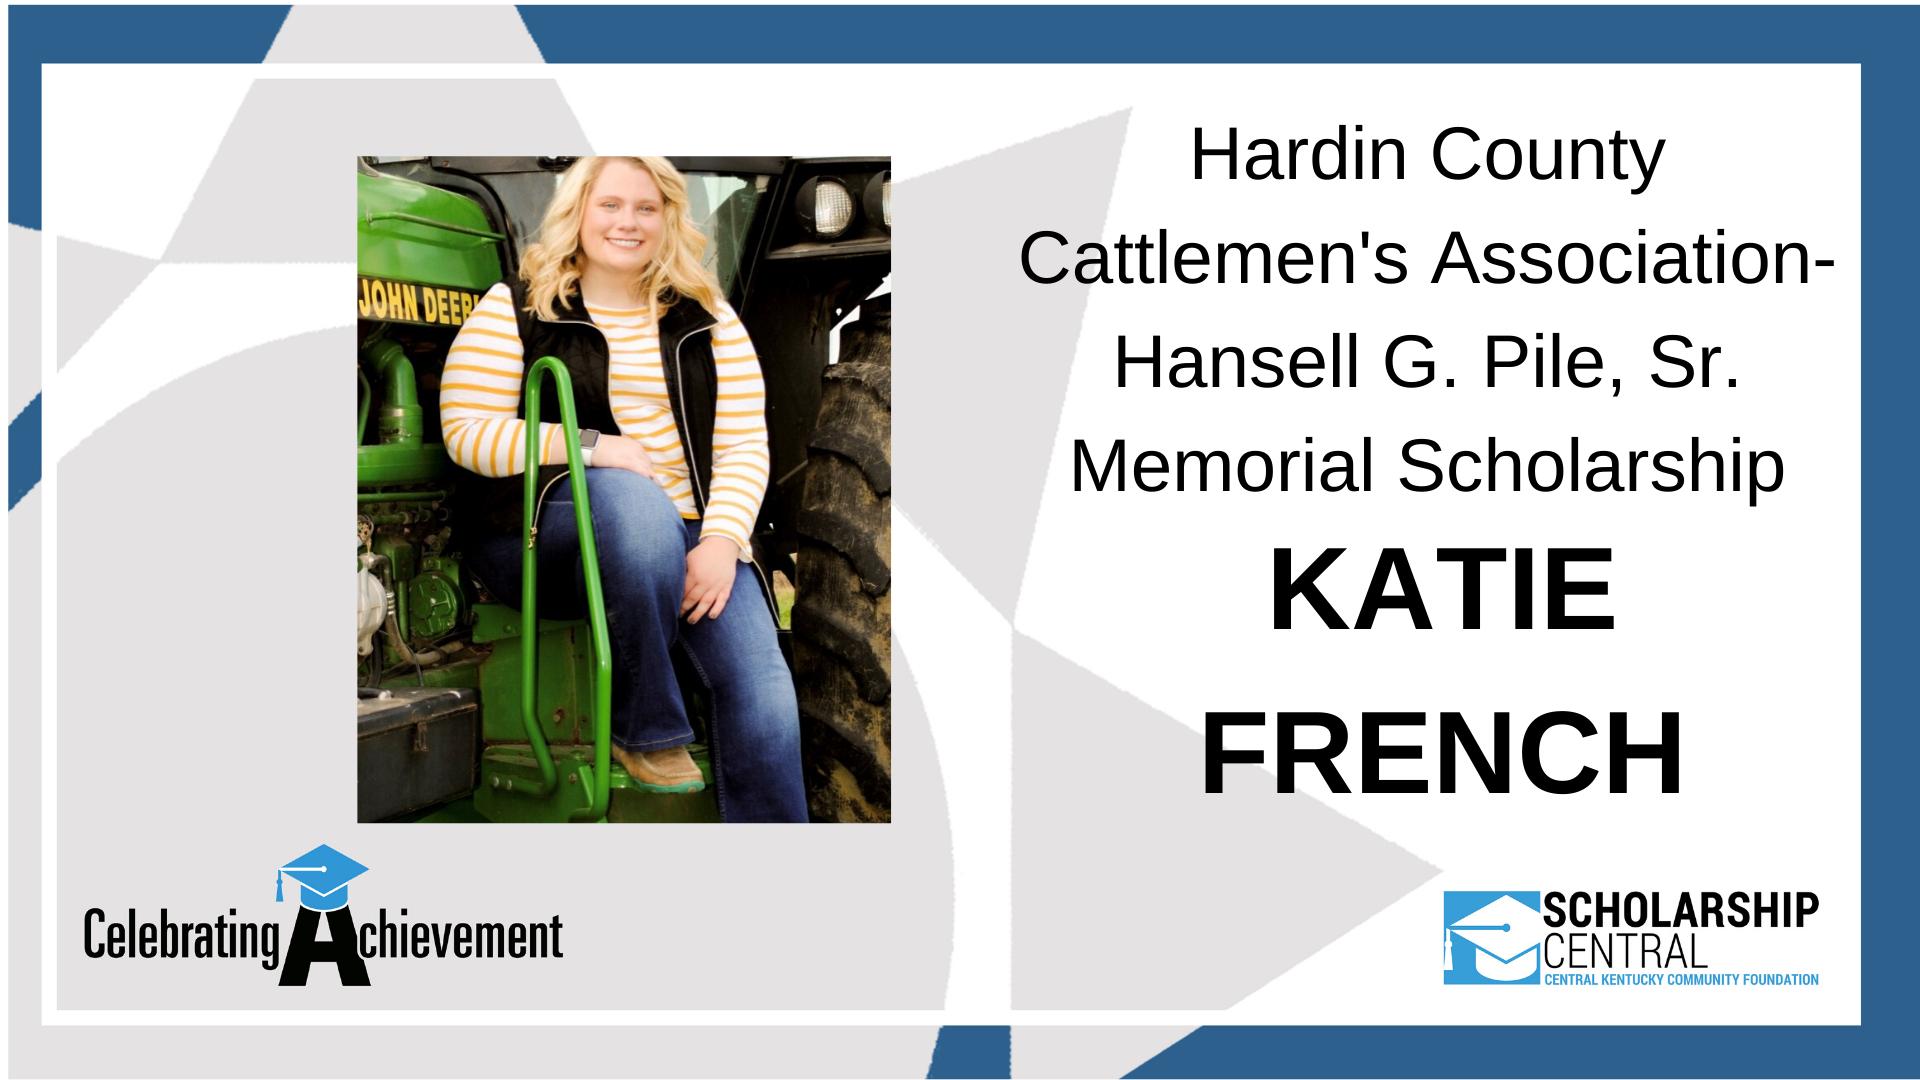 HC Cattleman Hansell G Pile Scholarship